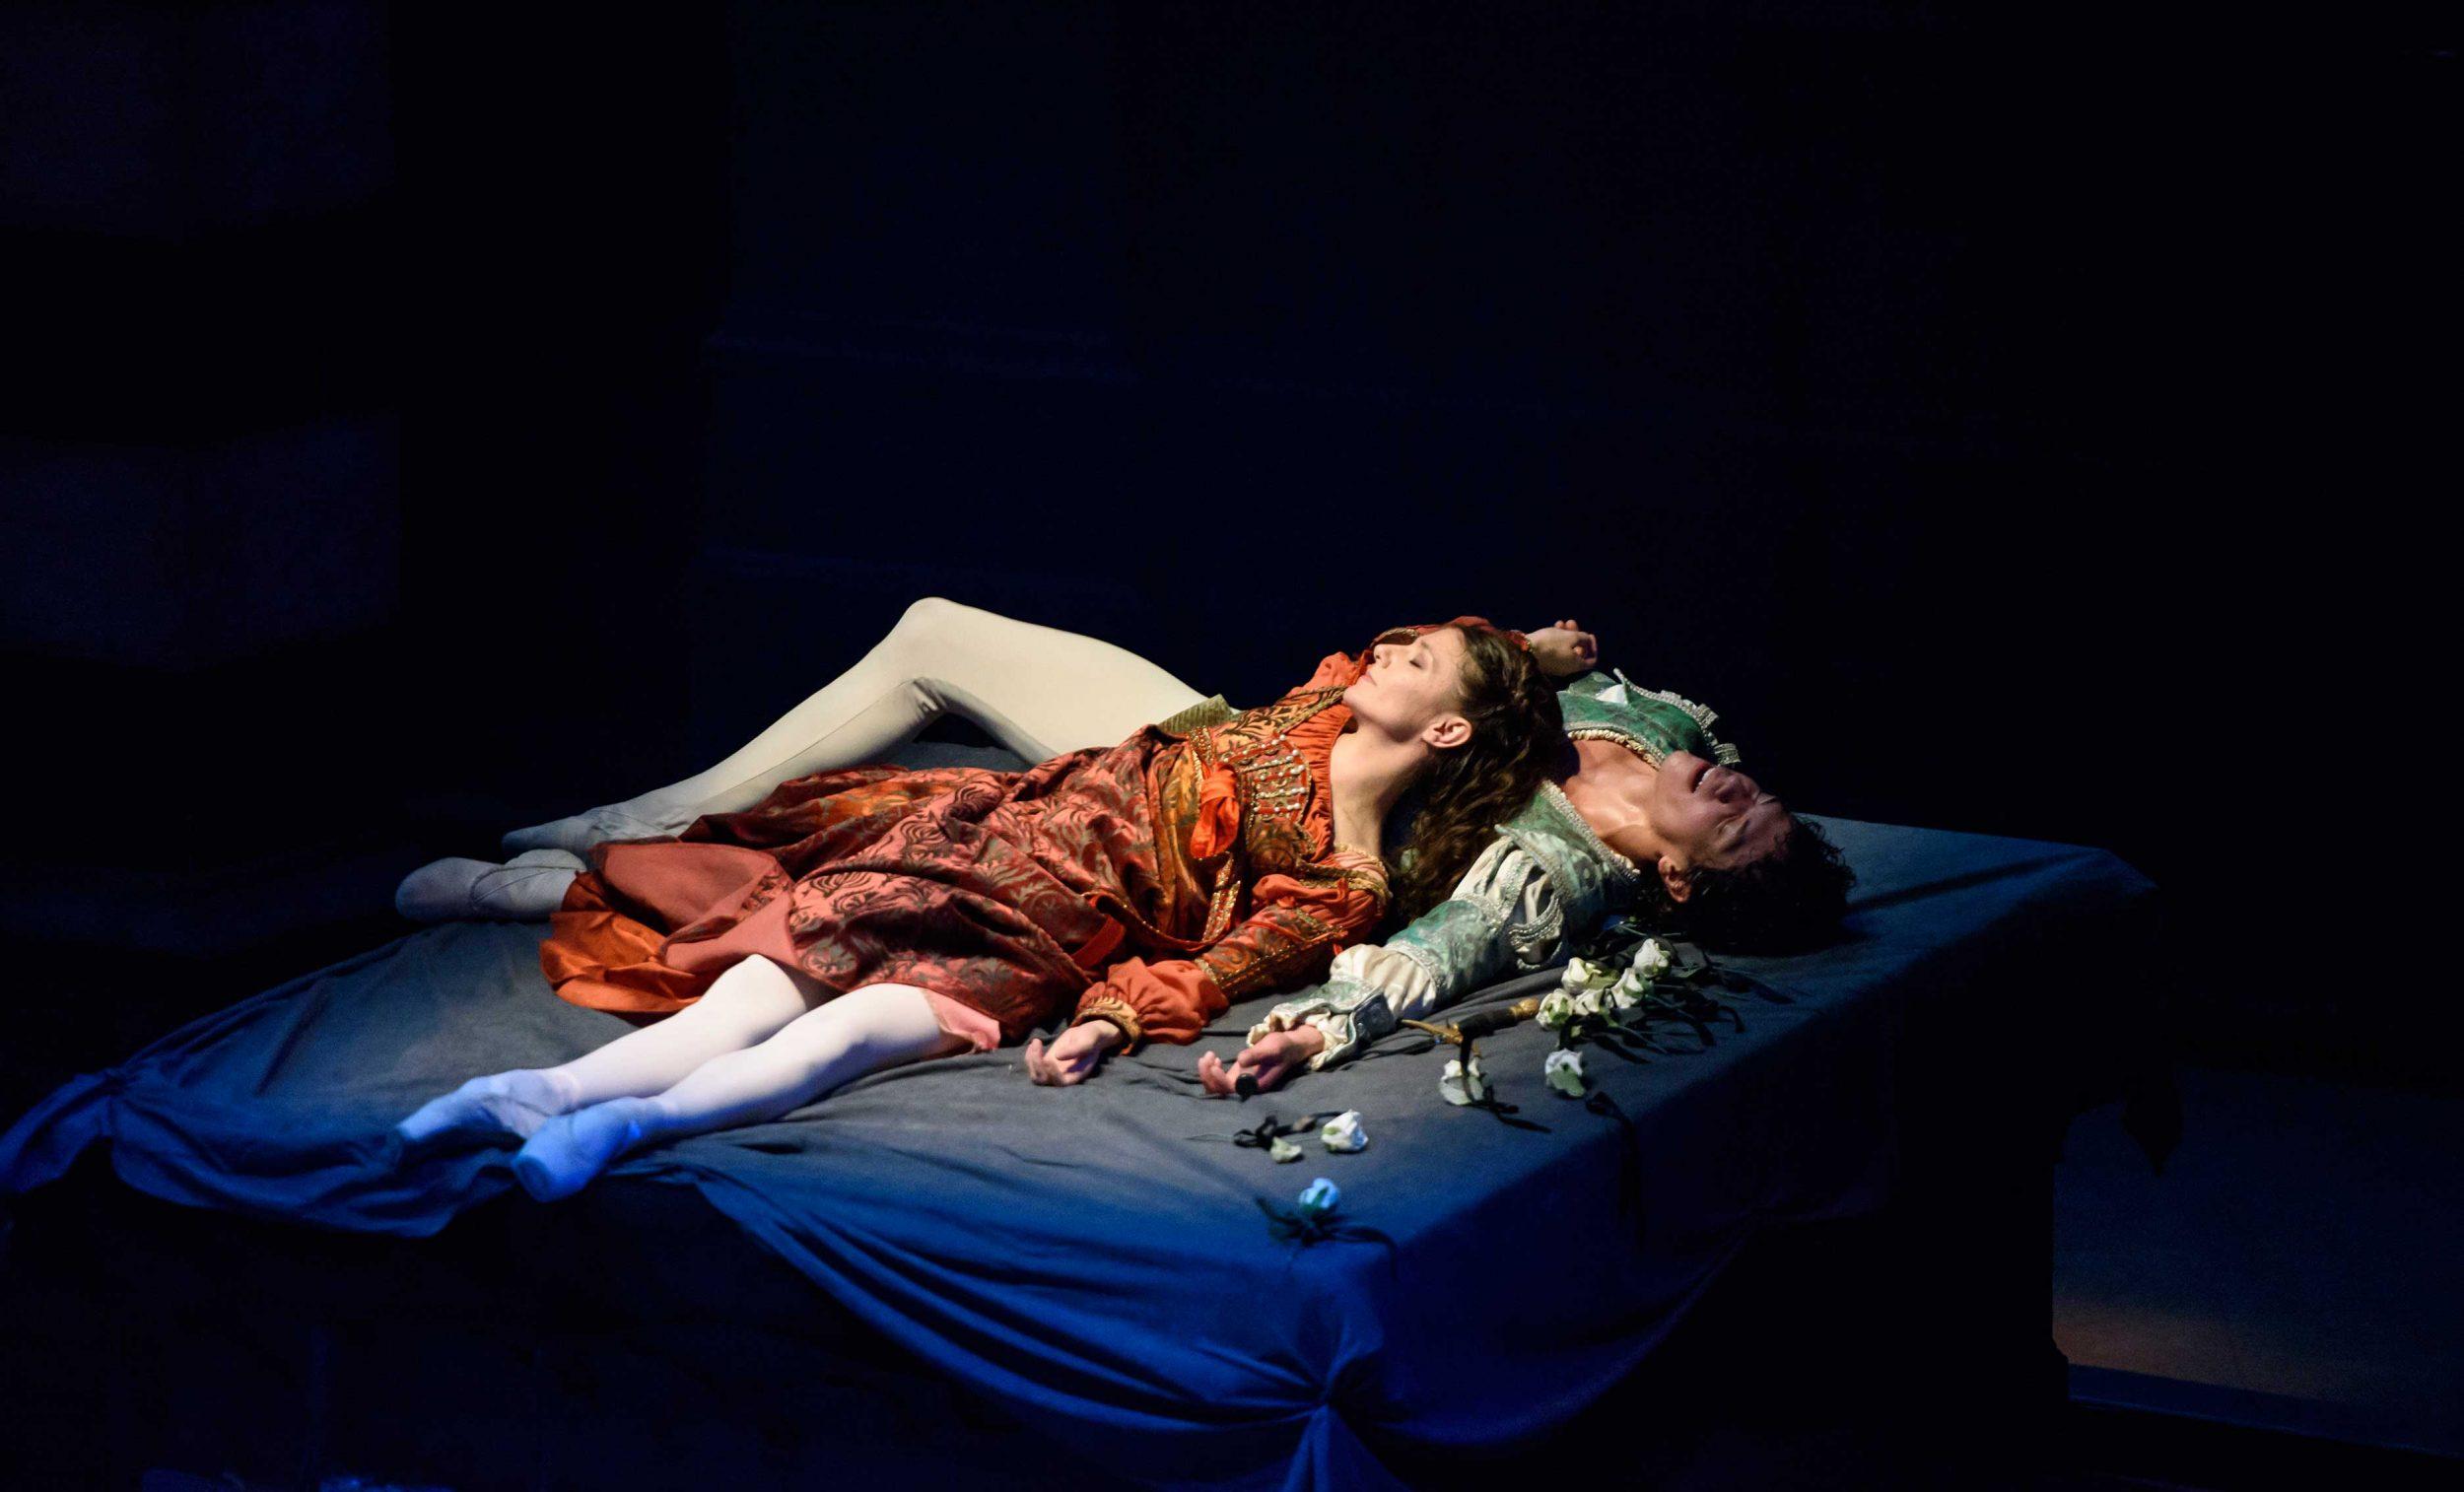 Alina-Cojocaru-and-Isaac-Hernandez-in-Romeo-&-Juliet-©Bill-Cooper-(5)